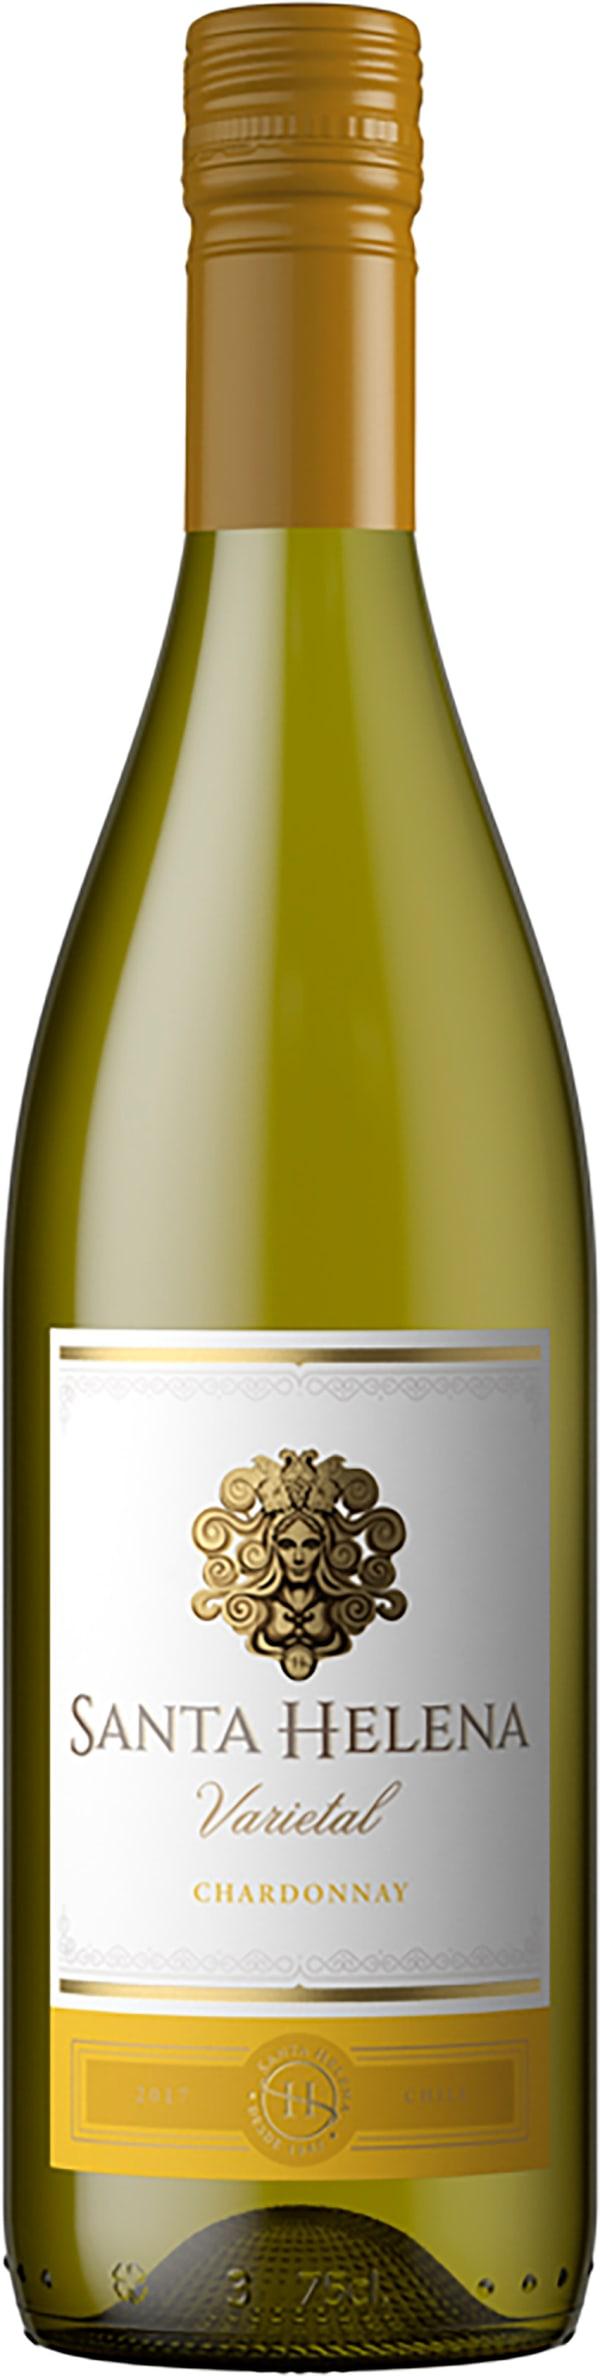 Santa Helena Varietal Chardonnay 2018